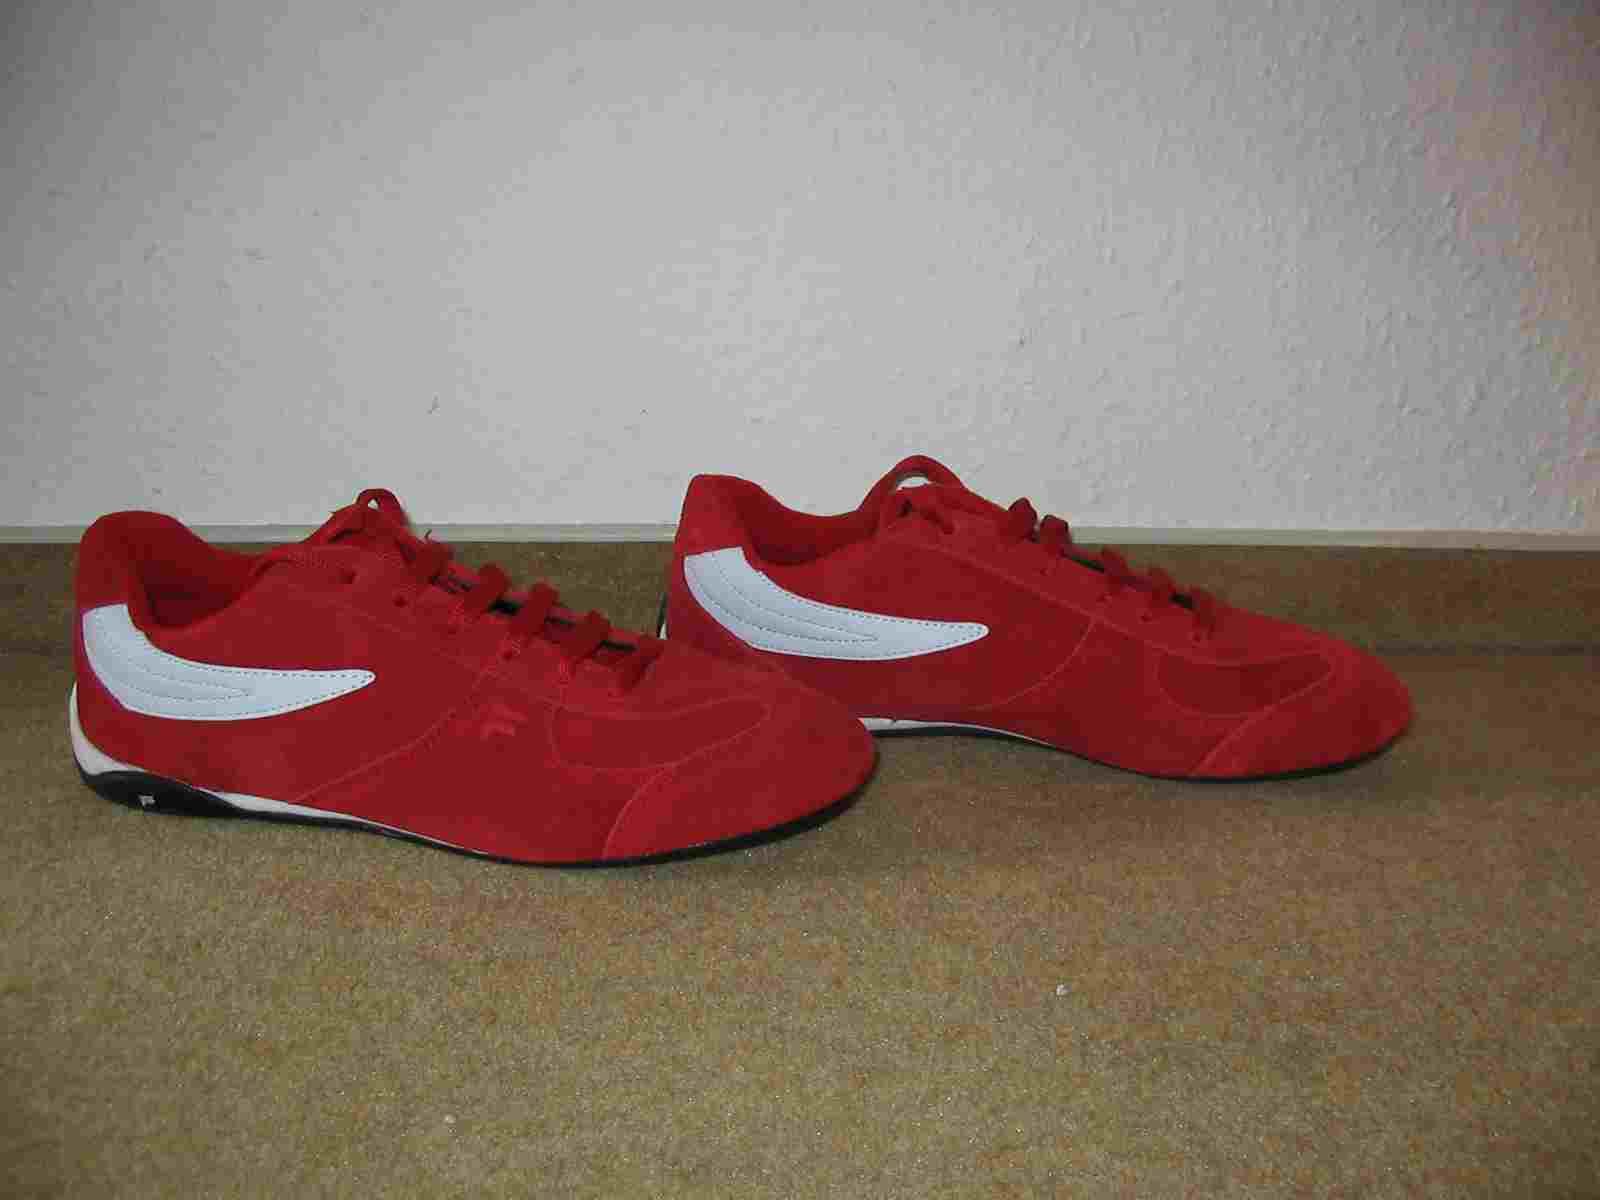 suche rote fila schuhe sneaker kleidung herrenschuhe sportschuhe 42705694. Black Bedroom Furniture Sets. Home Design Ideas